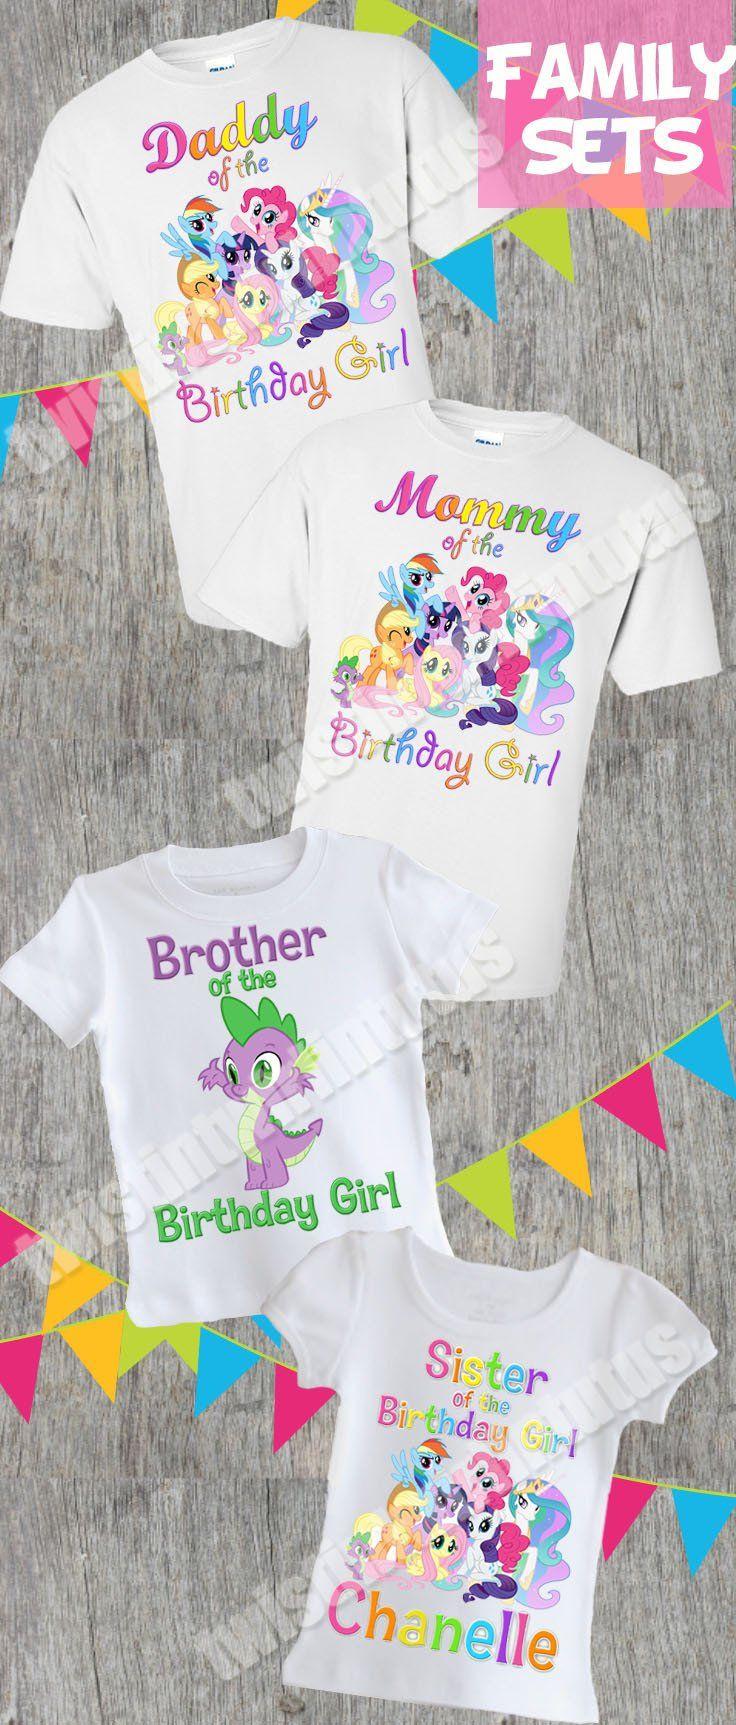 83083cc0 My Little Pony Family Birthday Shirts | My Little Pony Birthday Shirt | My  Little Pony Birthday Party Ideas | Birthday Ideas for Girls | Twisttin  Twirlin ...